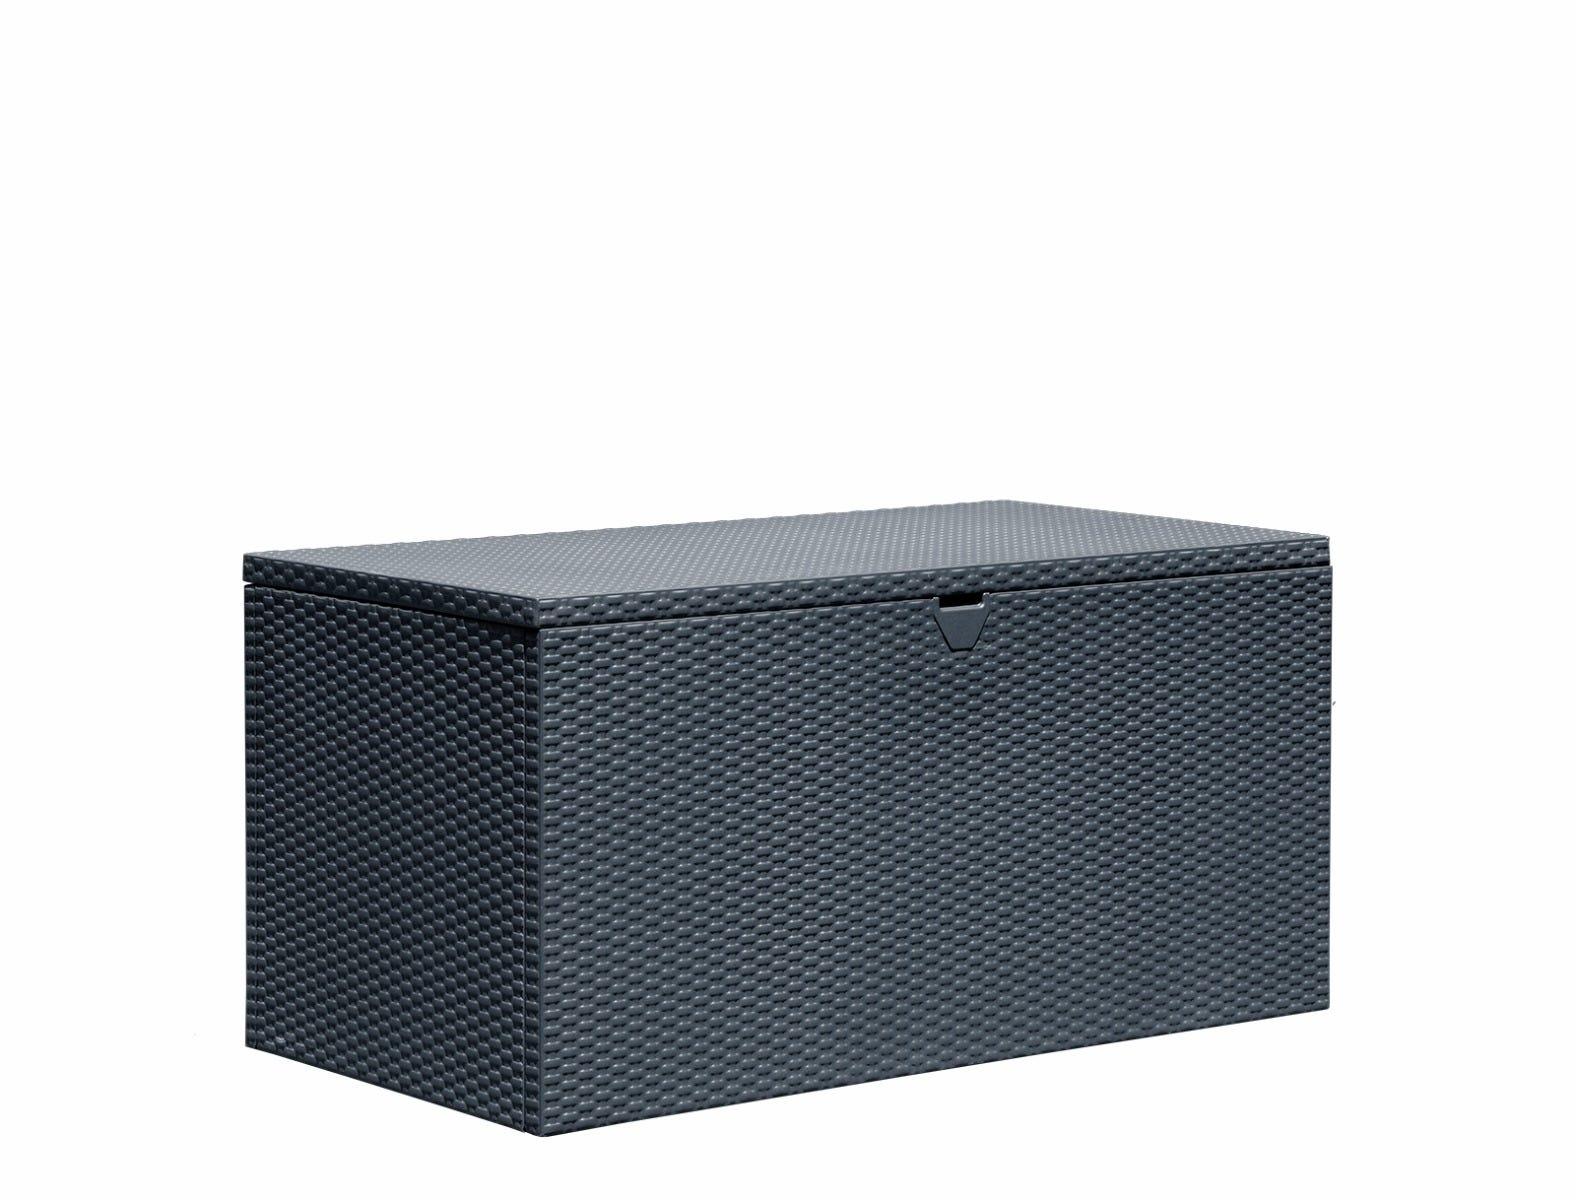 GoP Puteboks DeckBox 500 Antrasitt Stål